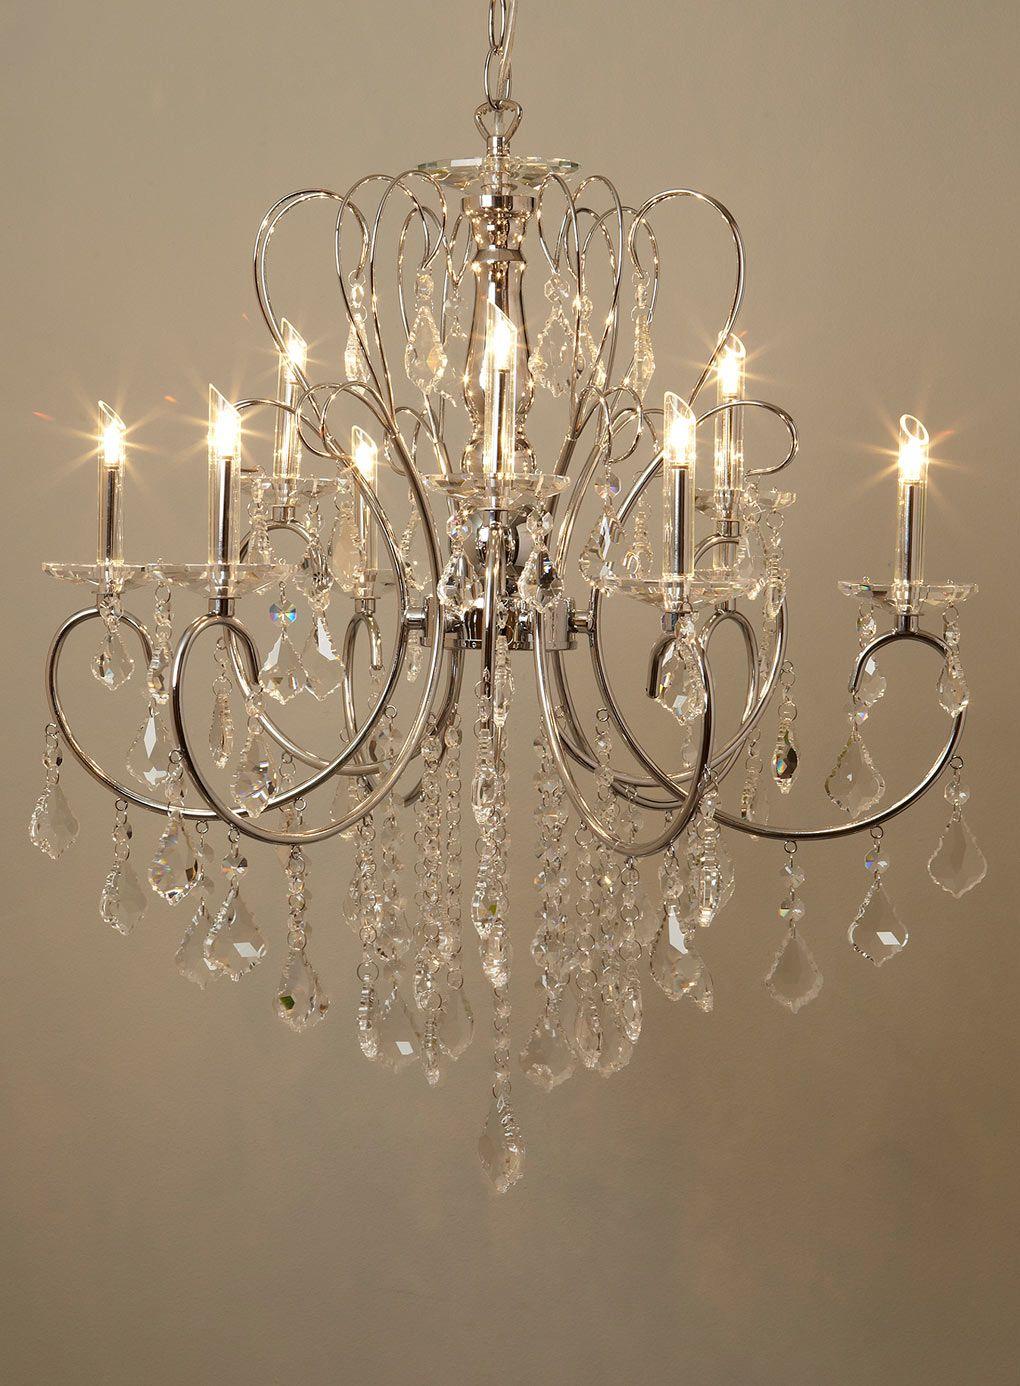 Silver Kinnari 9 Light Chandelier  Ceiling Lights